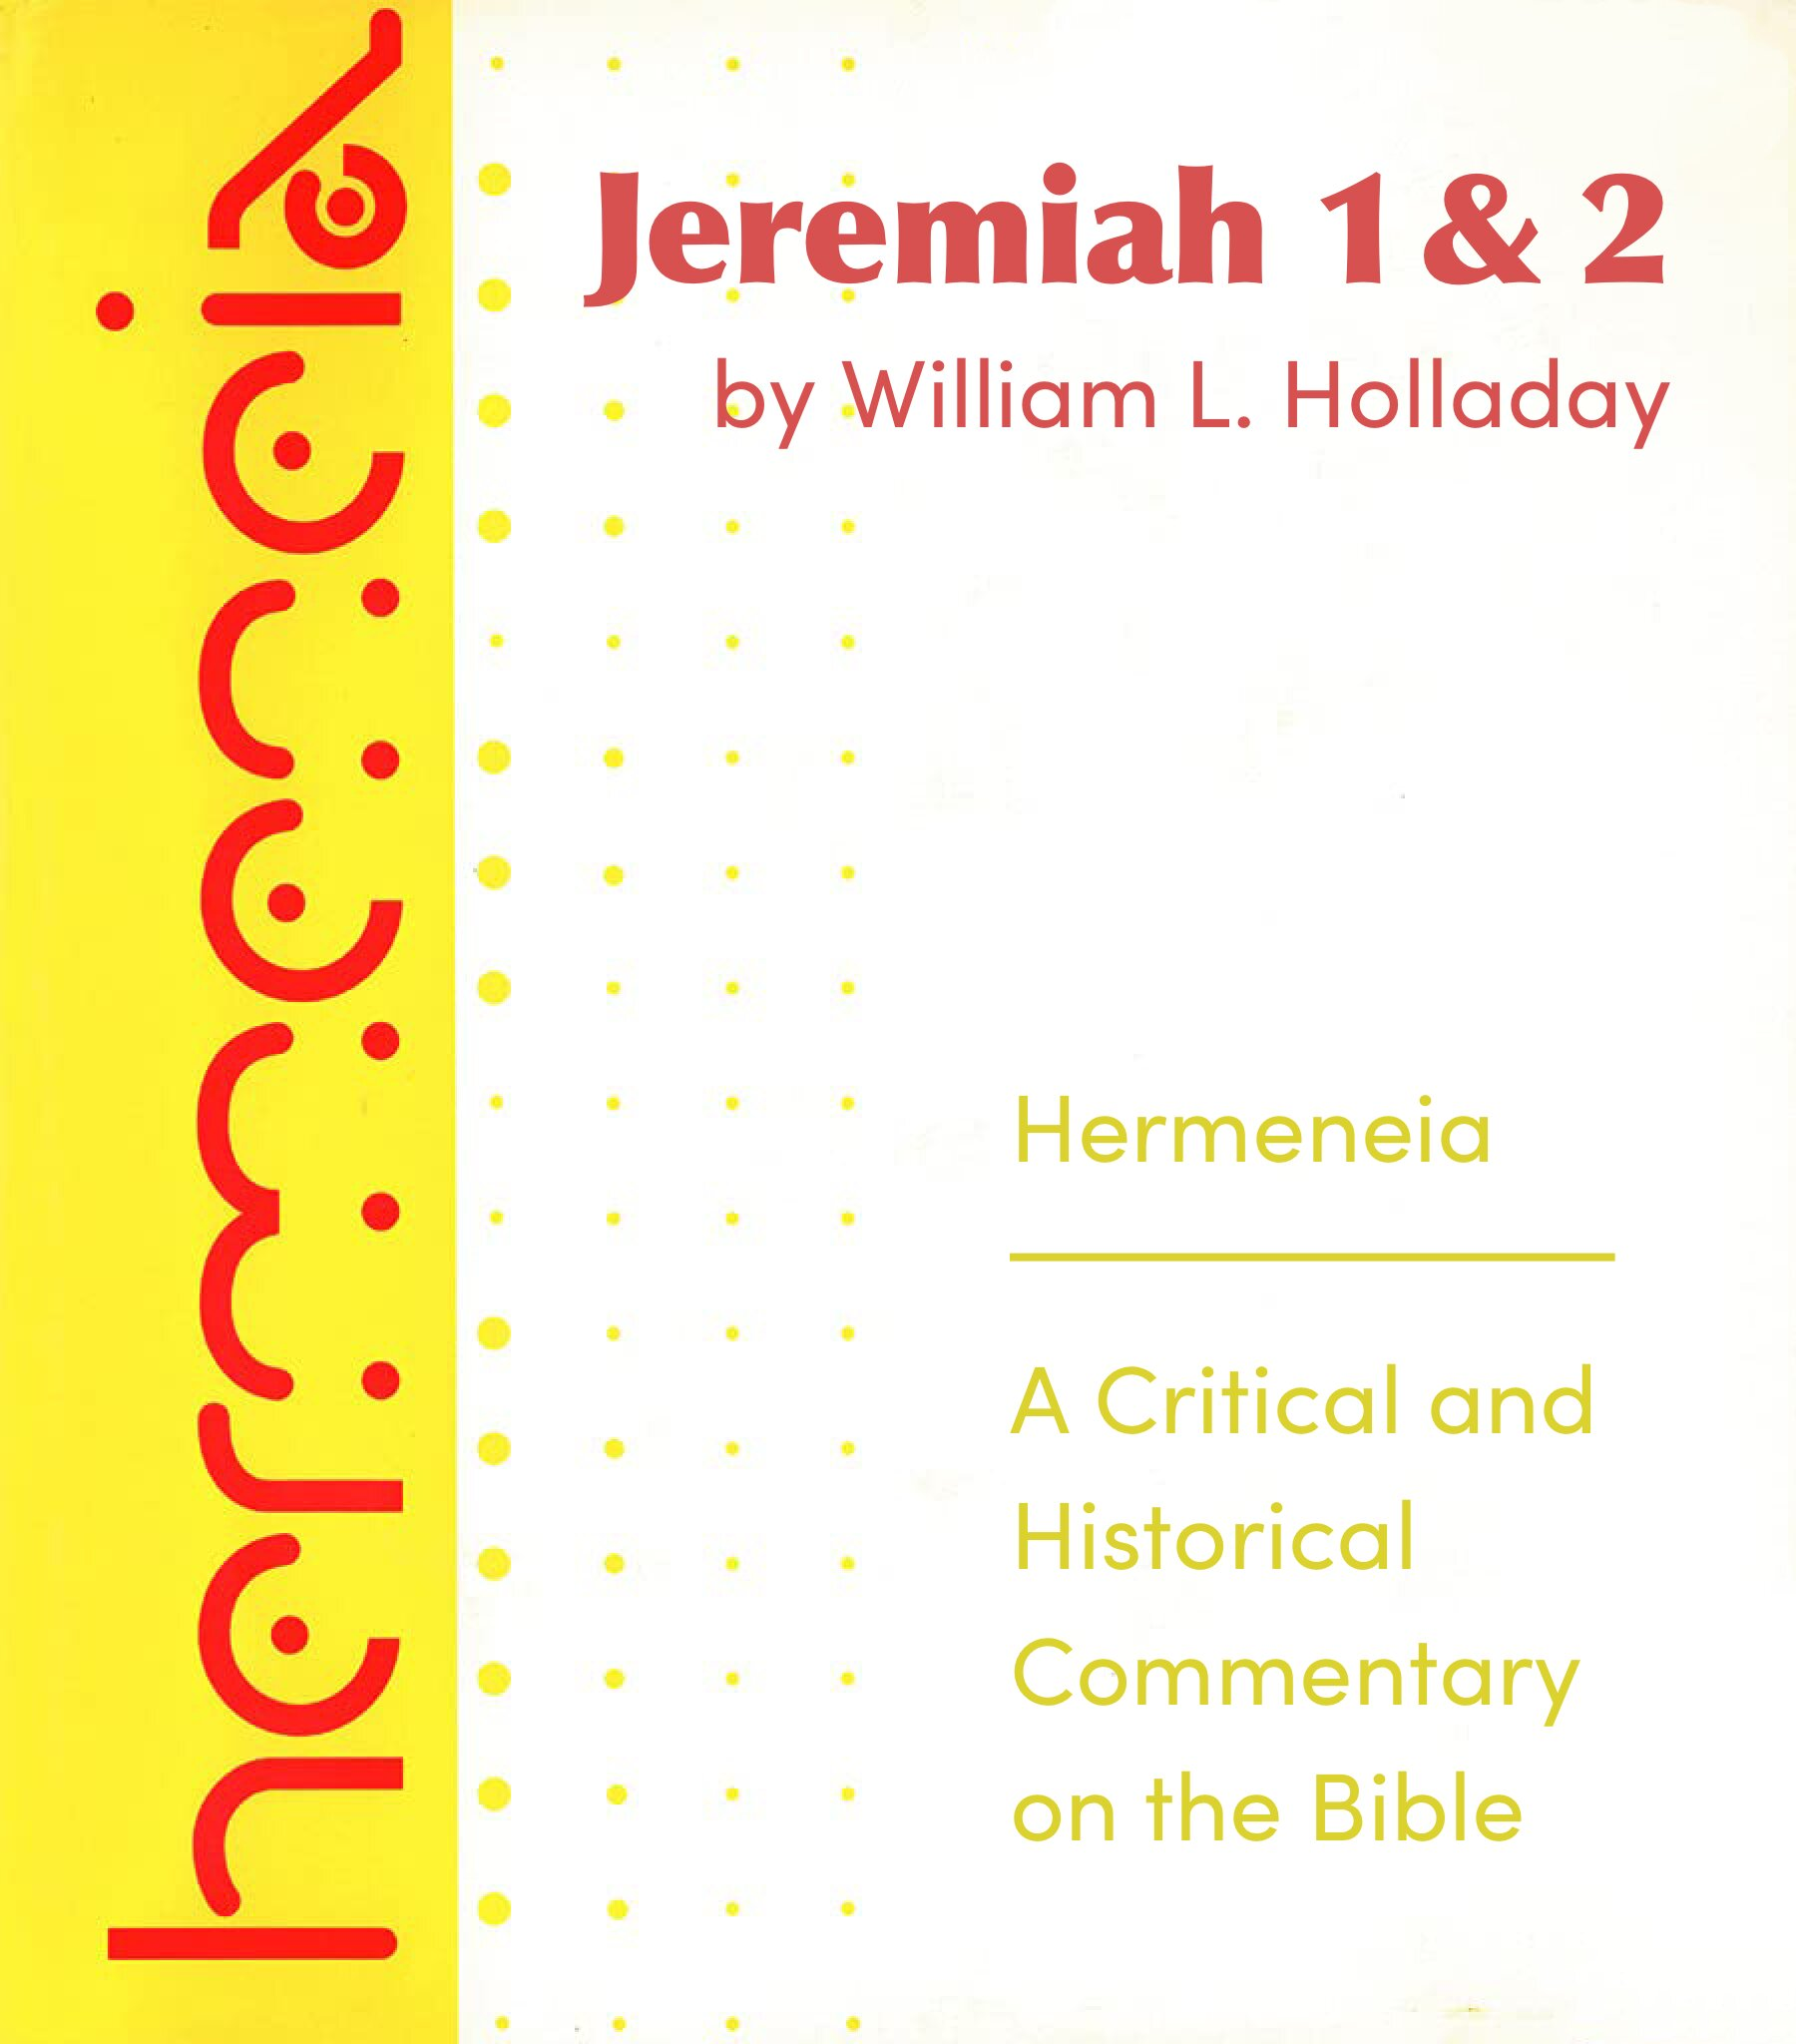 Jeremiah, vols 1 & 2 (Hermeneia Commentary | HERM)